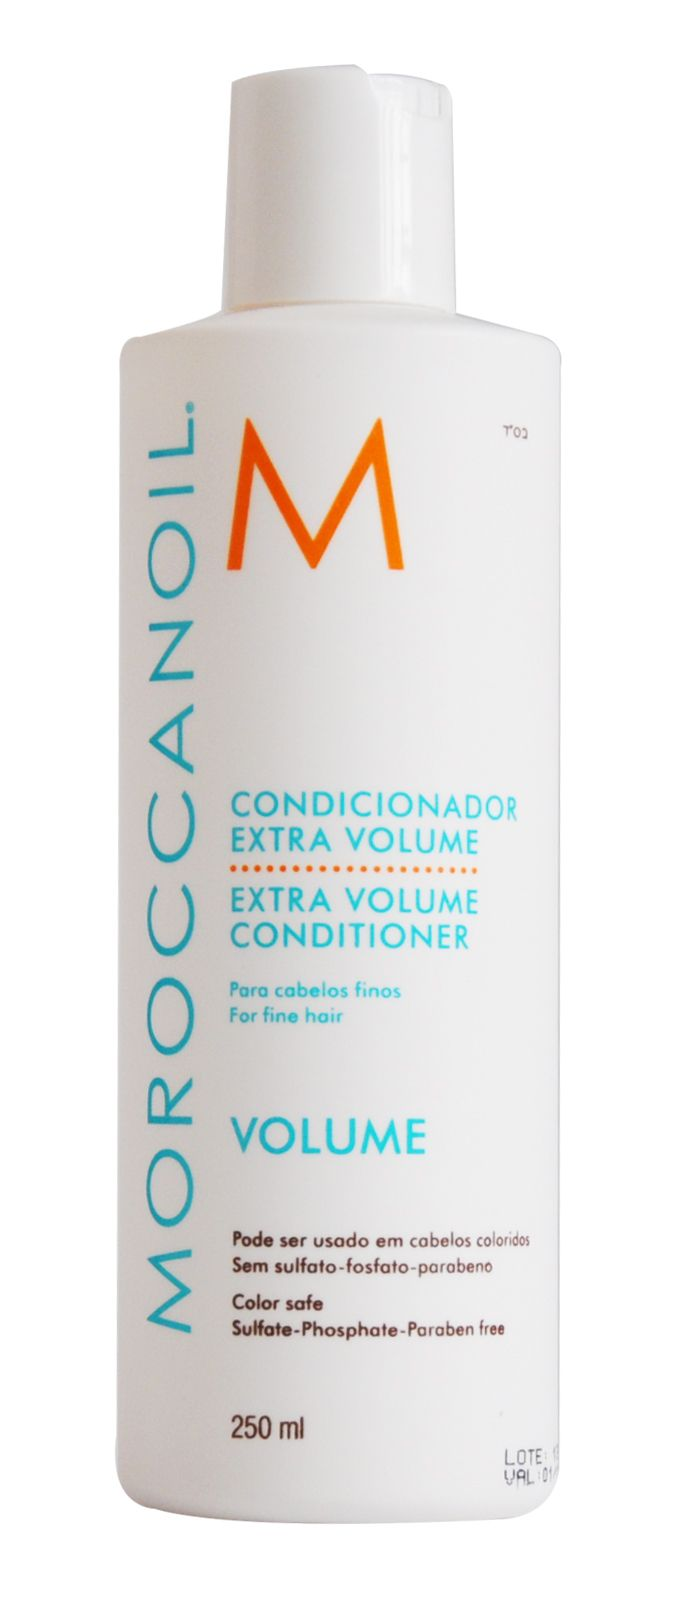 Moroccanoil Condicionador Extra Volume 250 ml